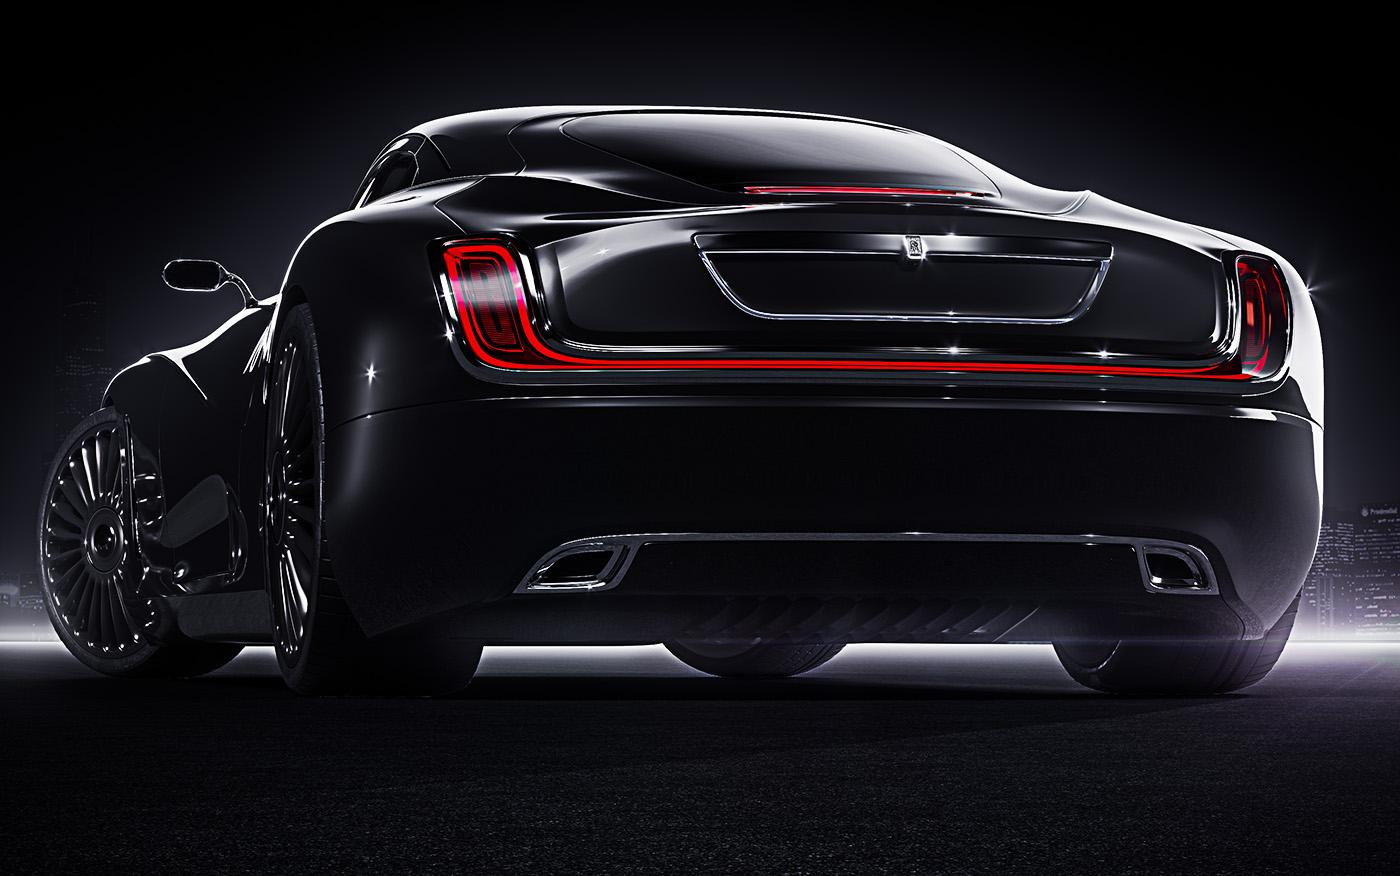 Rolls Royce luxury automotive design 7.jpg